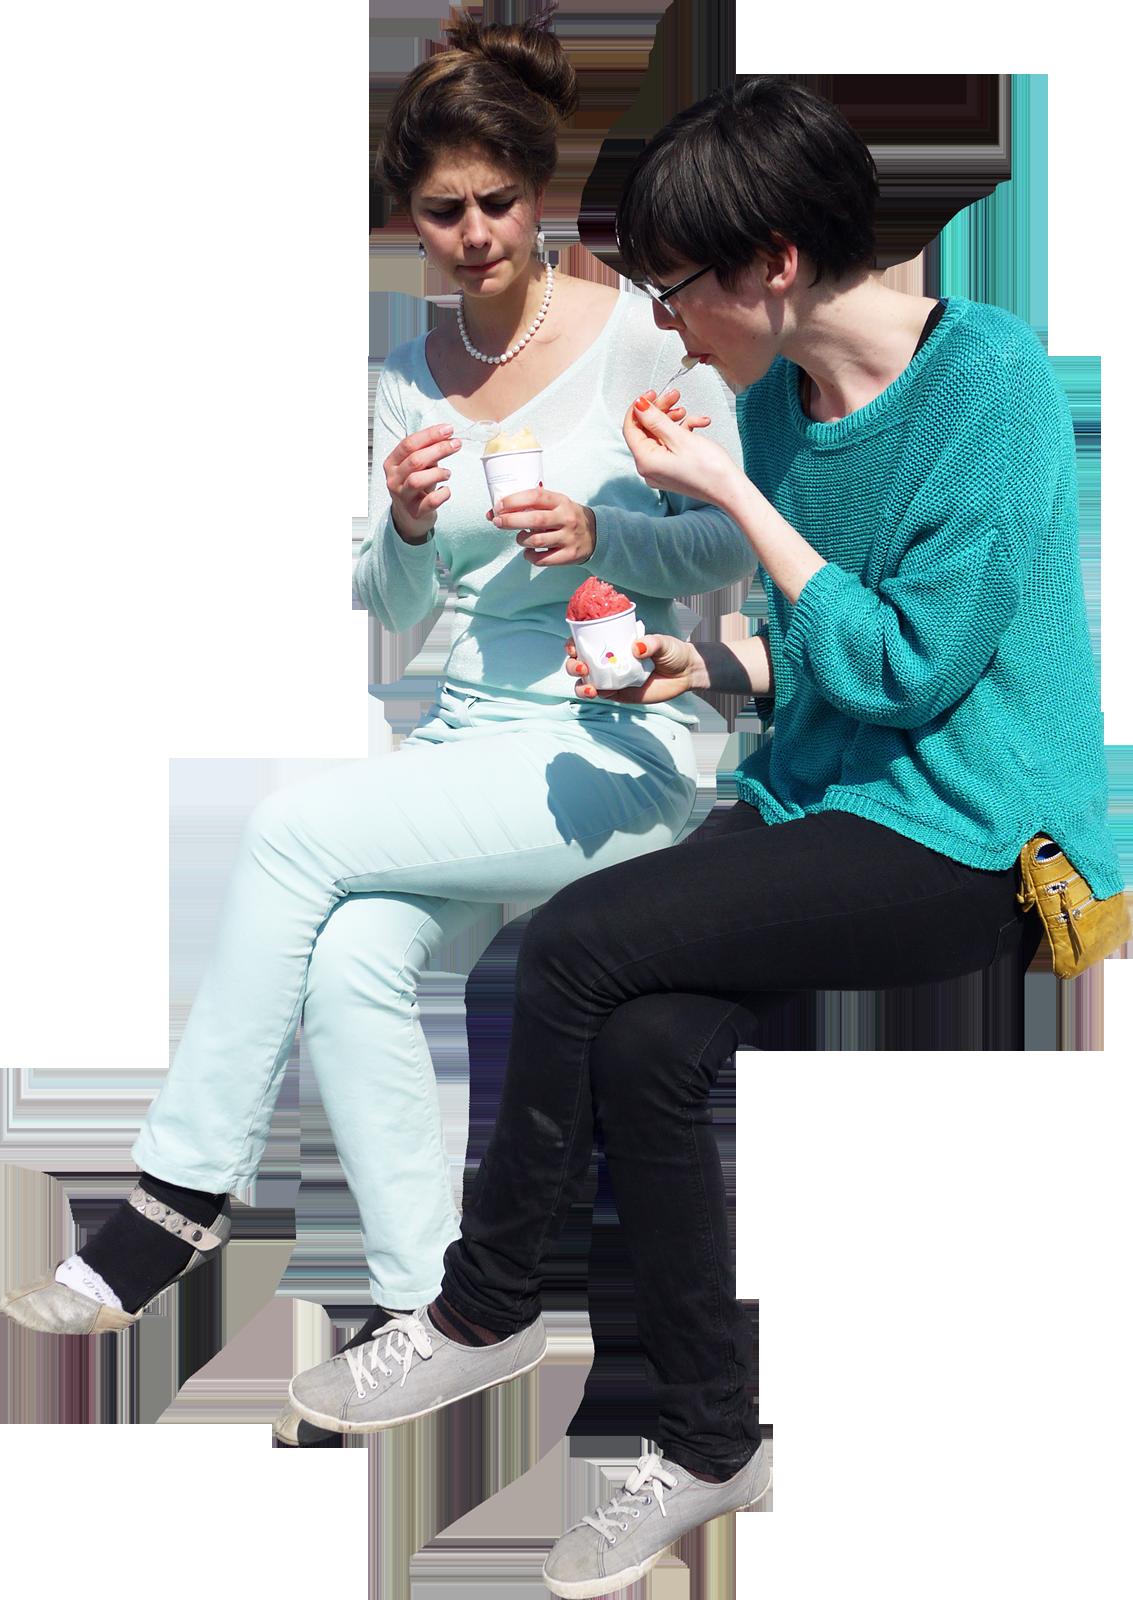 Girls Eating Ice Cream Photoshop Tekentips Mensen